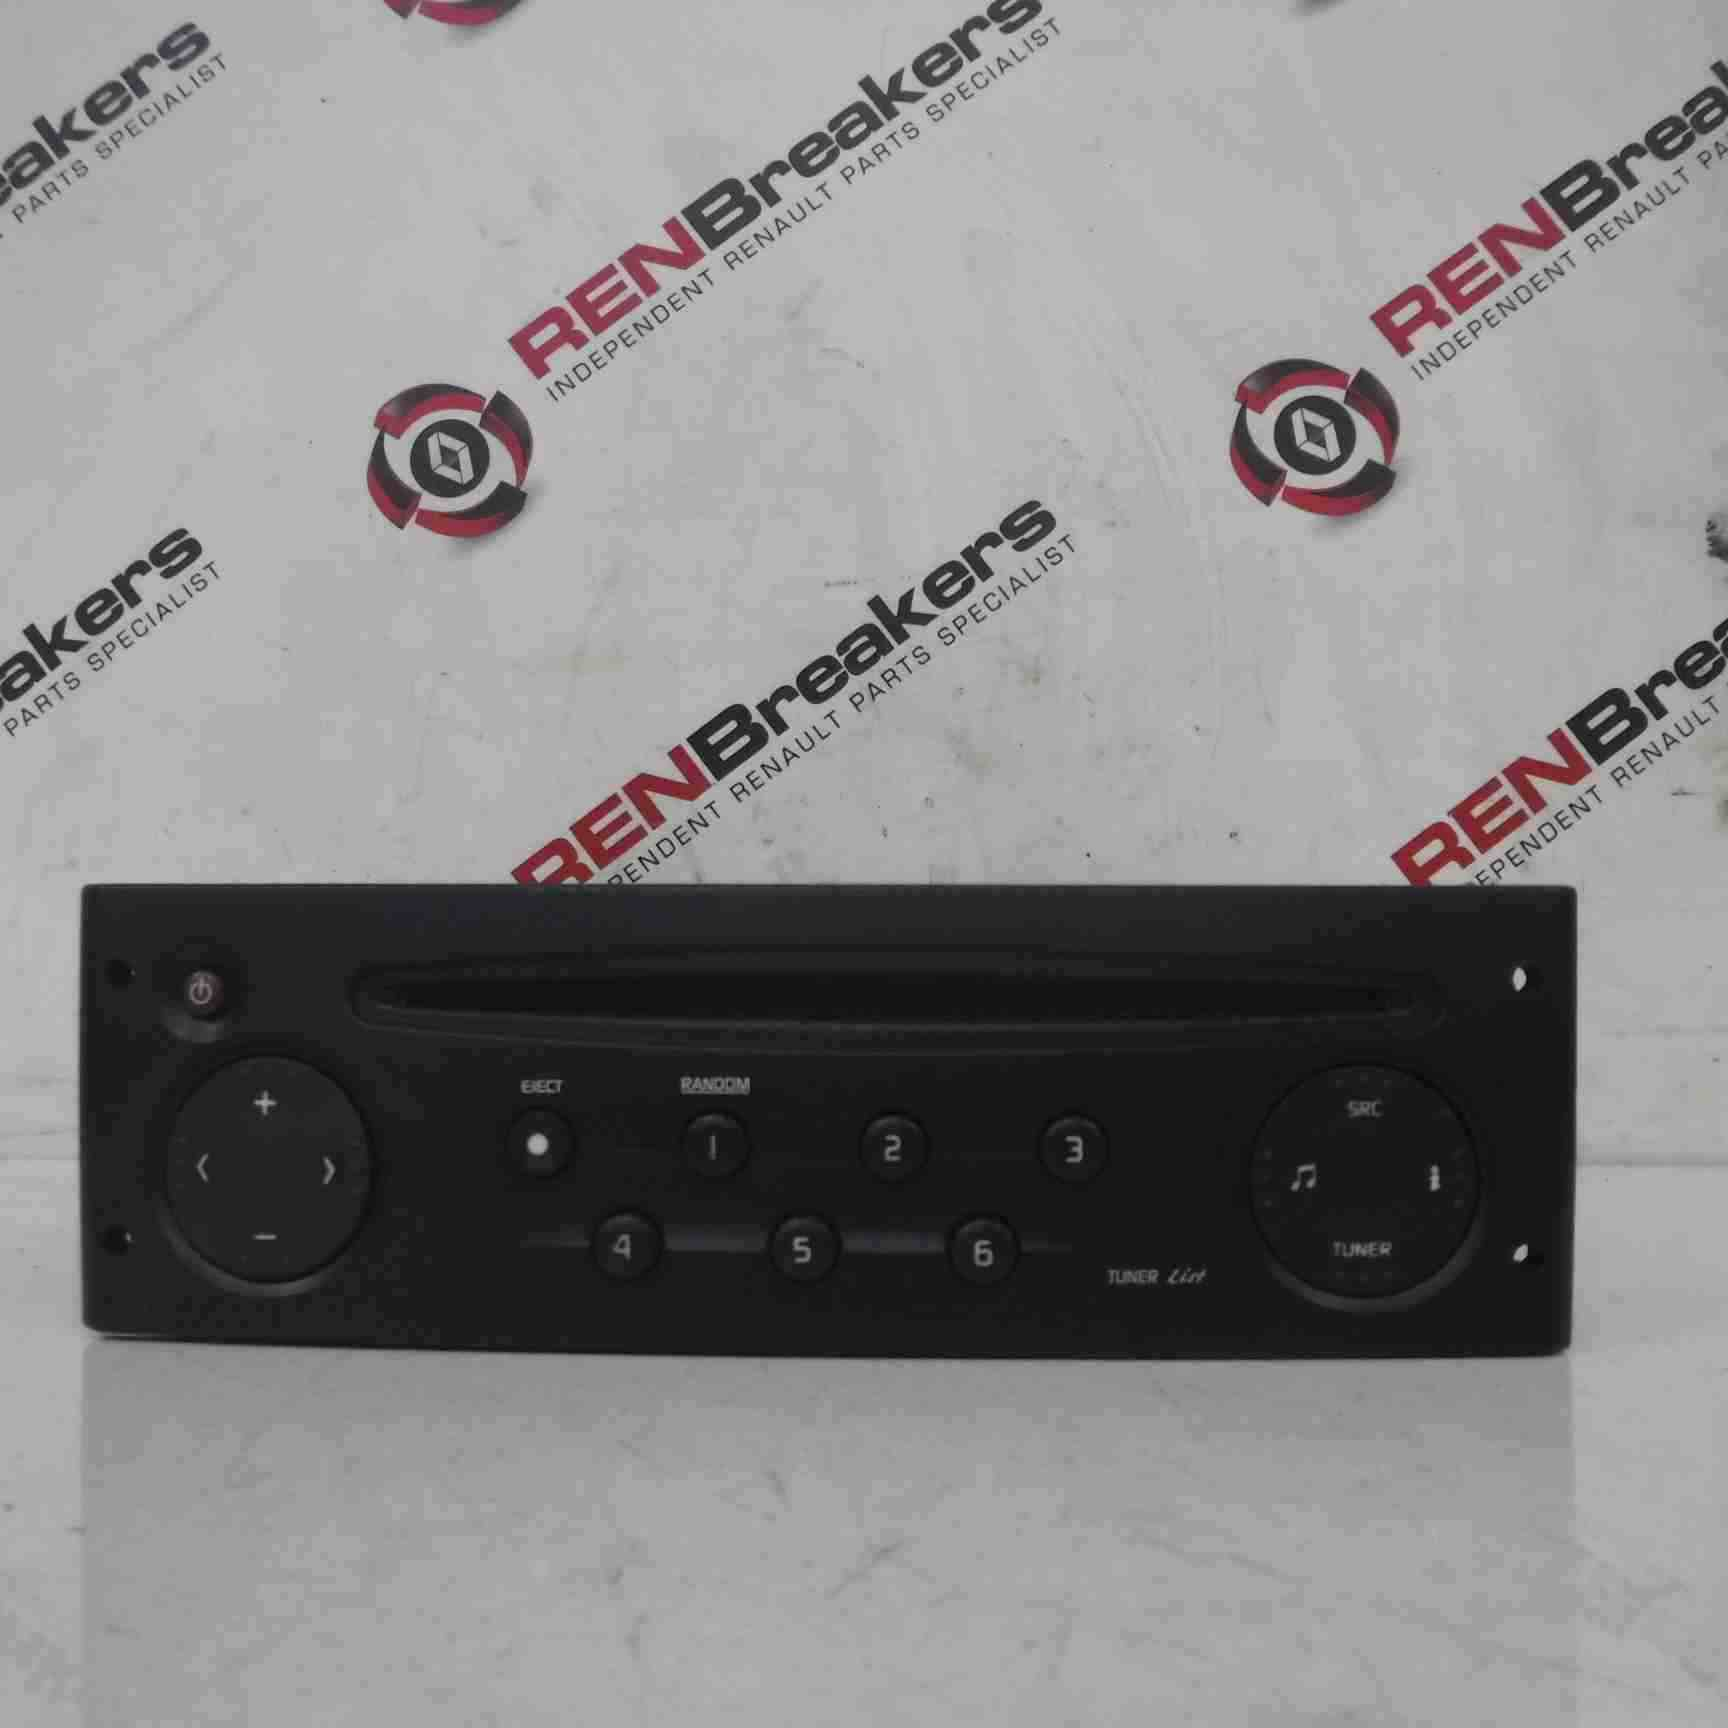 Renault Clio Sport 2001-2006 172 182 Radio Cd Player Tuner List + Code